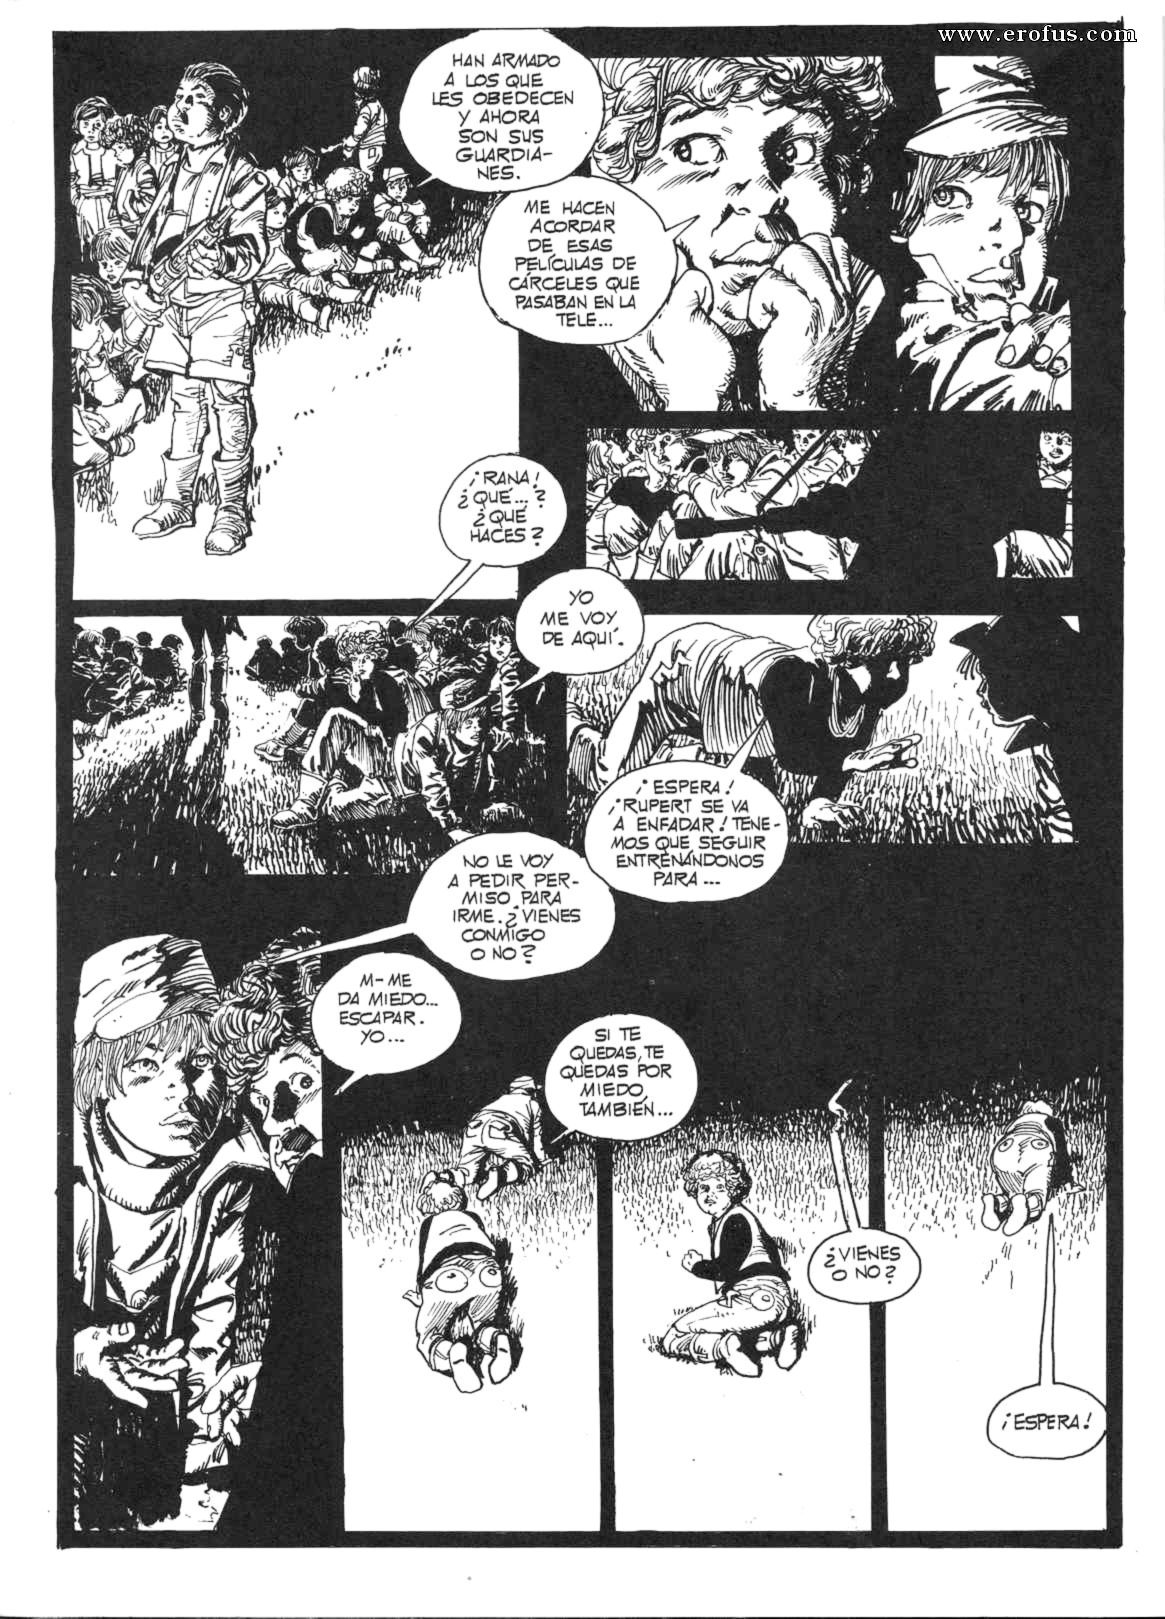 Carceles Porn page 53 | horacio-altuna-comics/el-ultimo-recreo/spanish